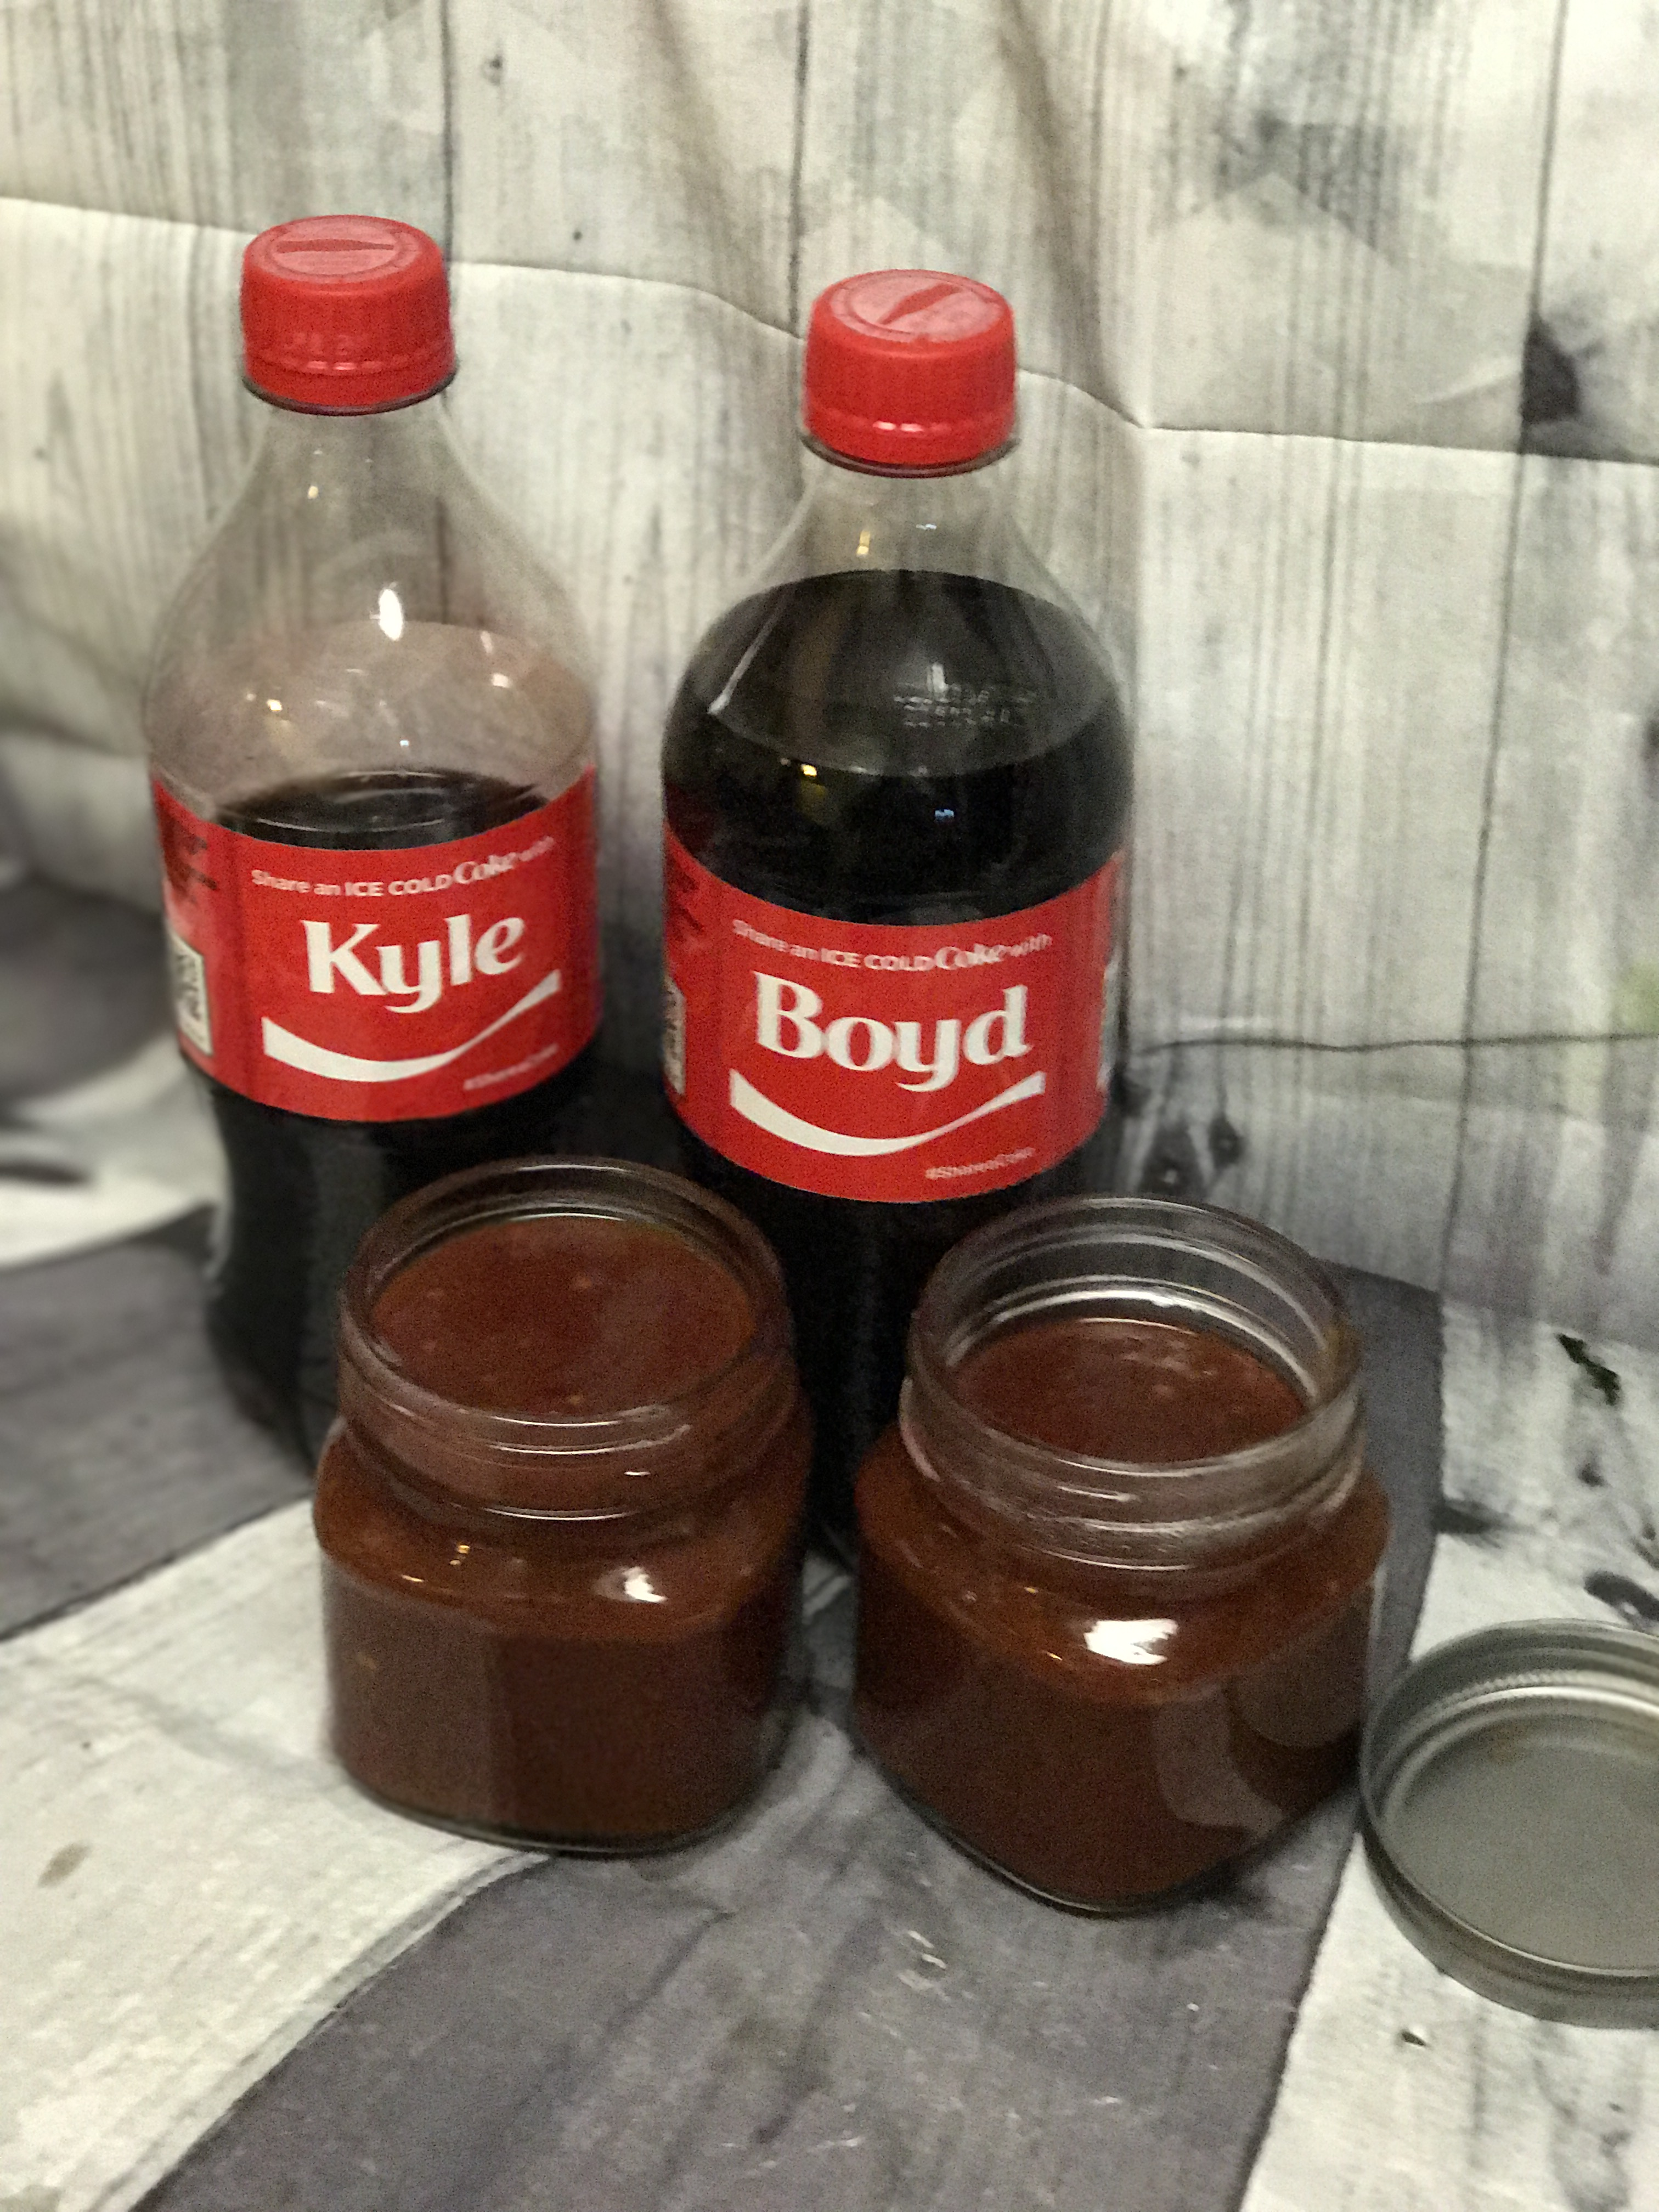 Smokey & Spicy Coca-Cola BBQ Sauce #IceColdSummerMoments #ad